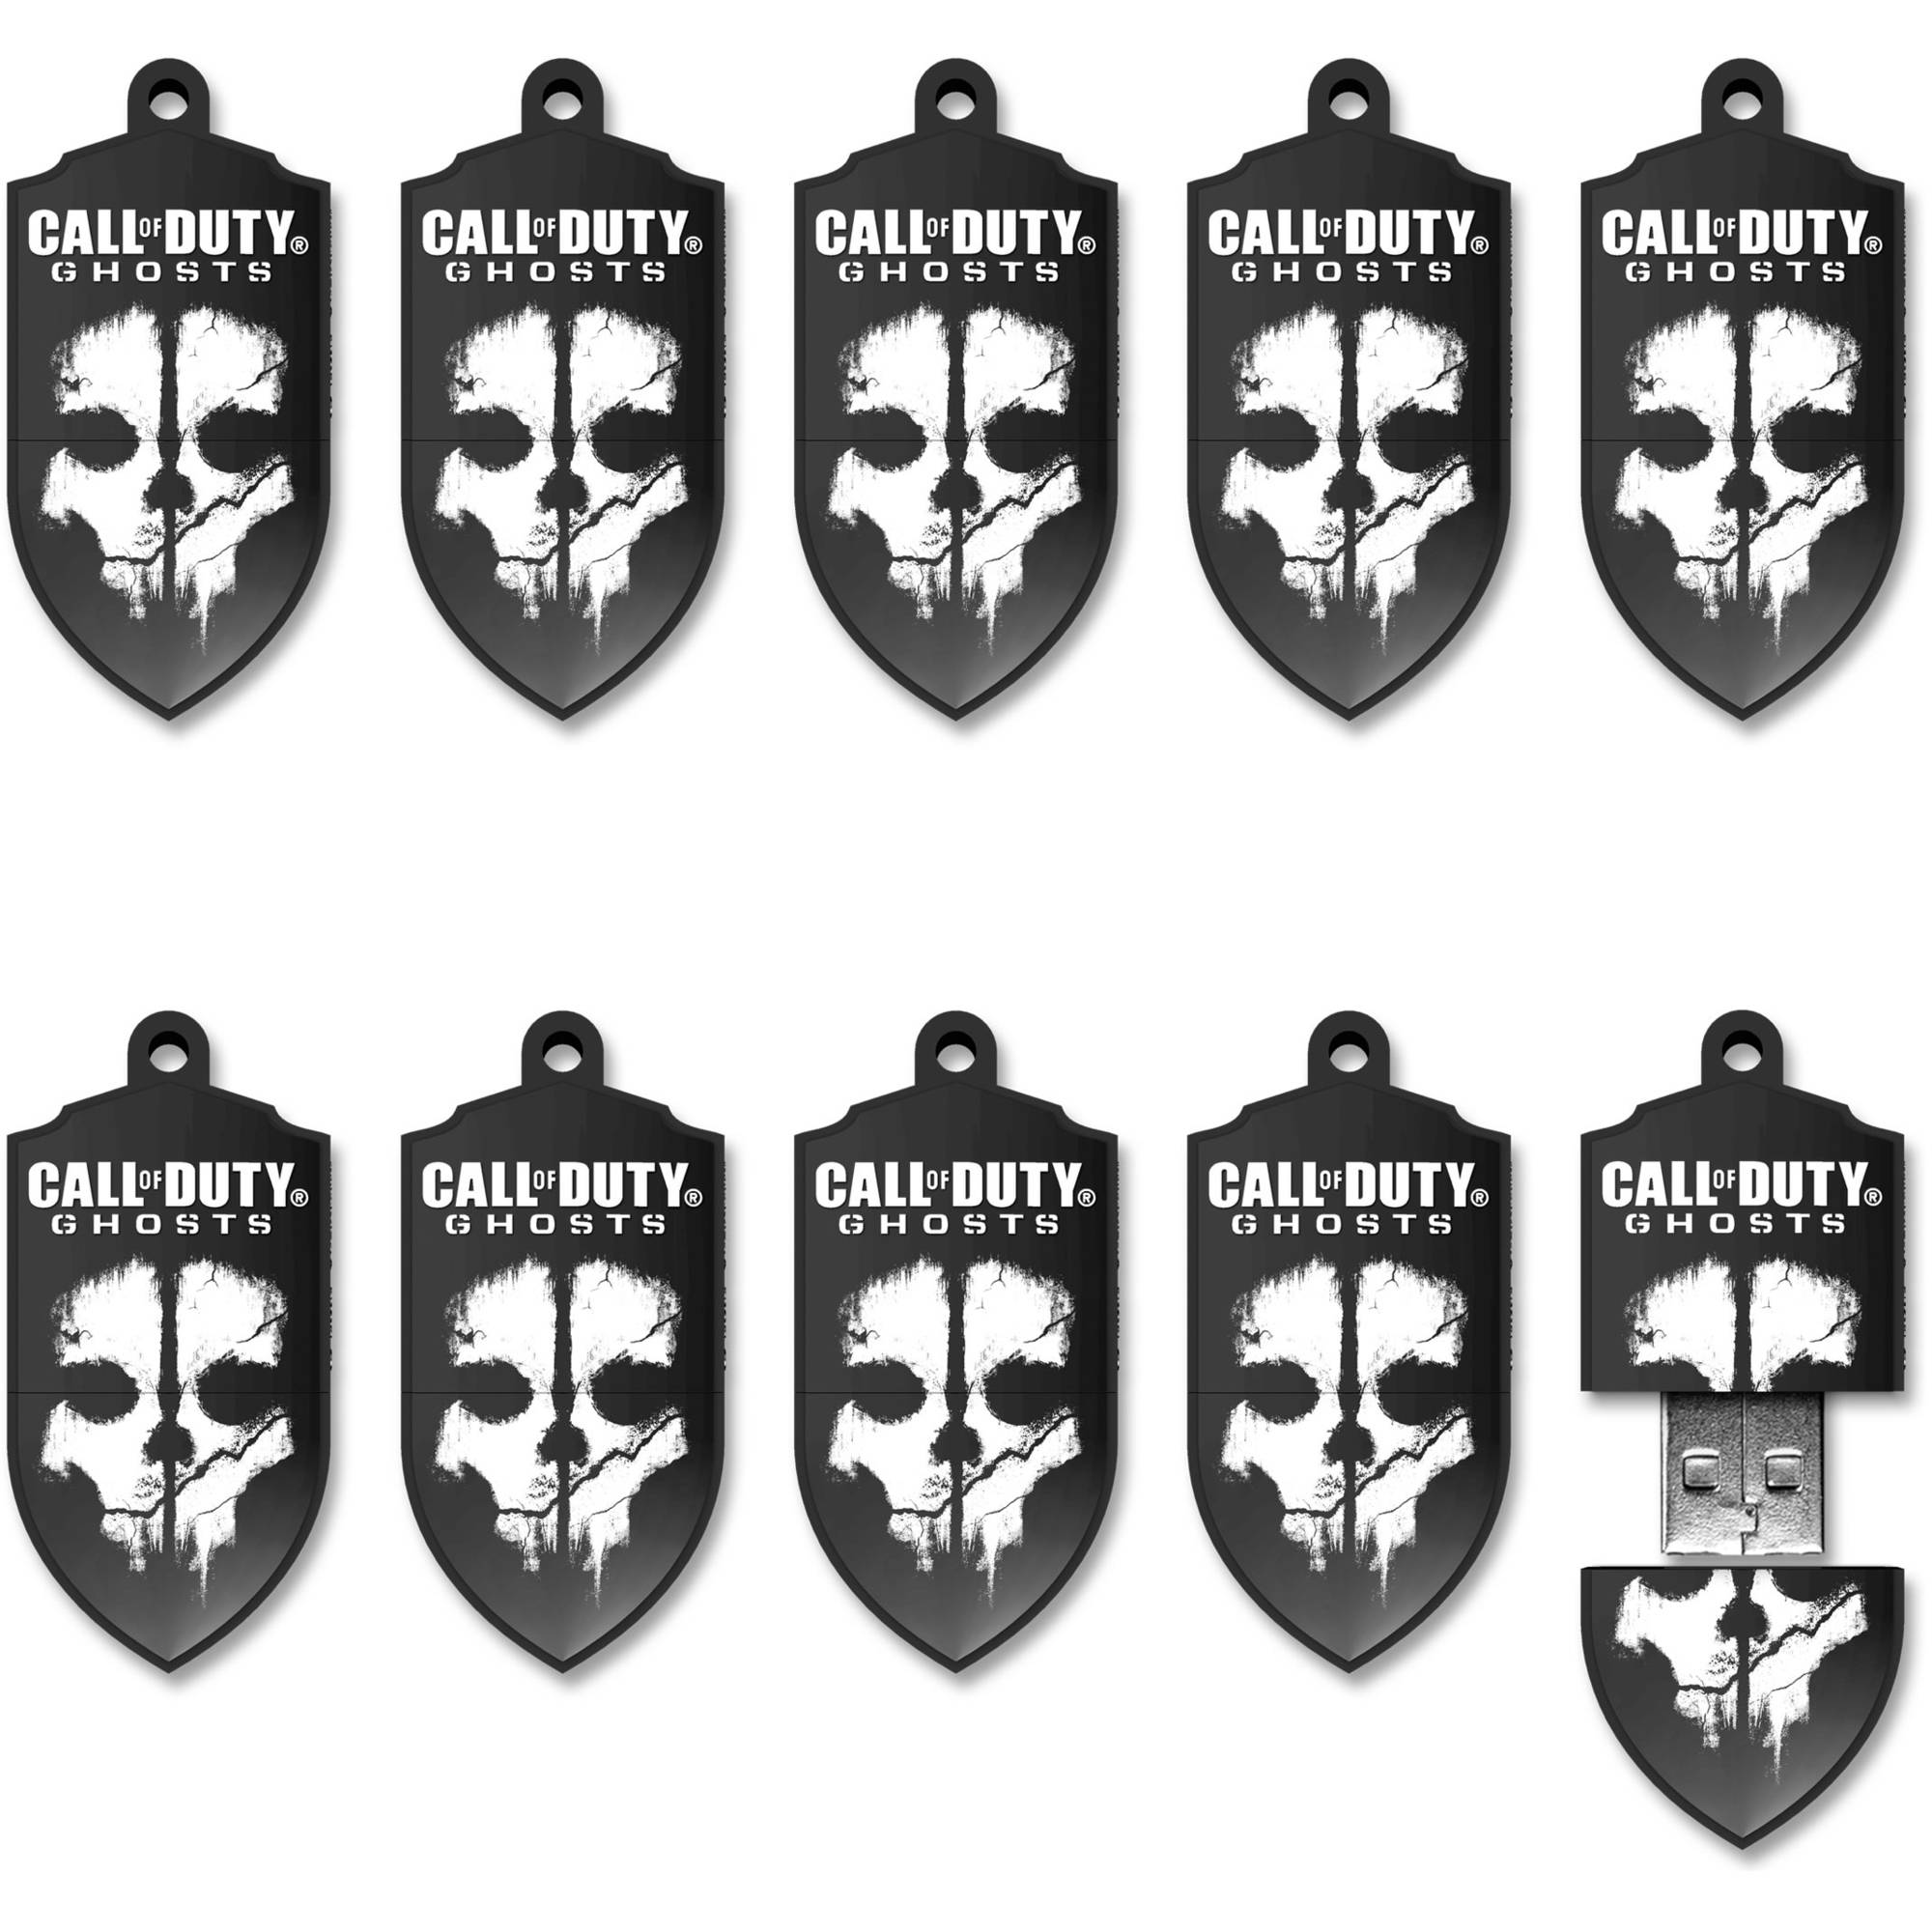 Call of Duty: Ghosts 8GB USB Flash Drive